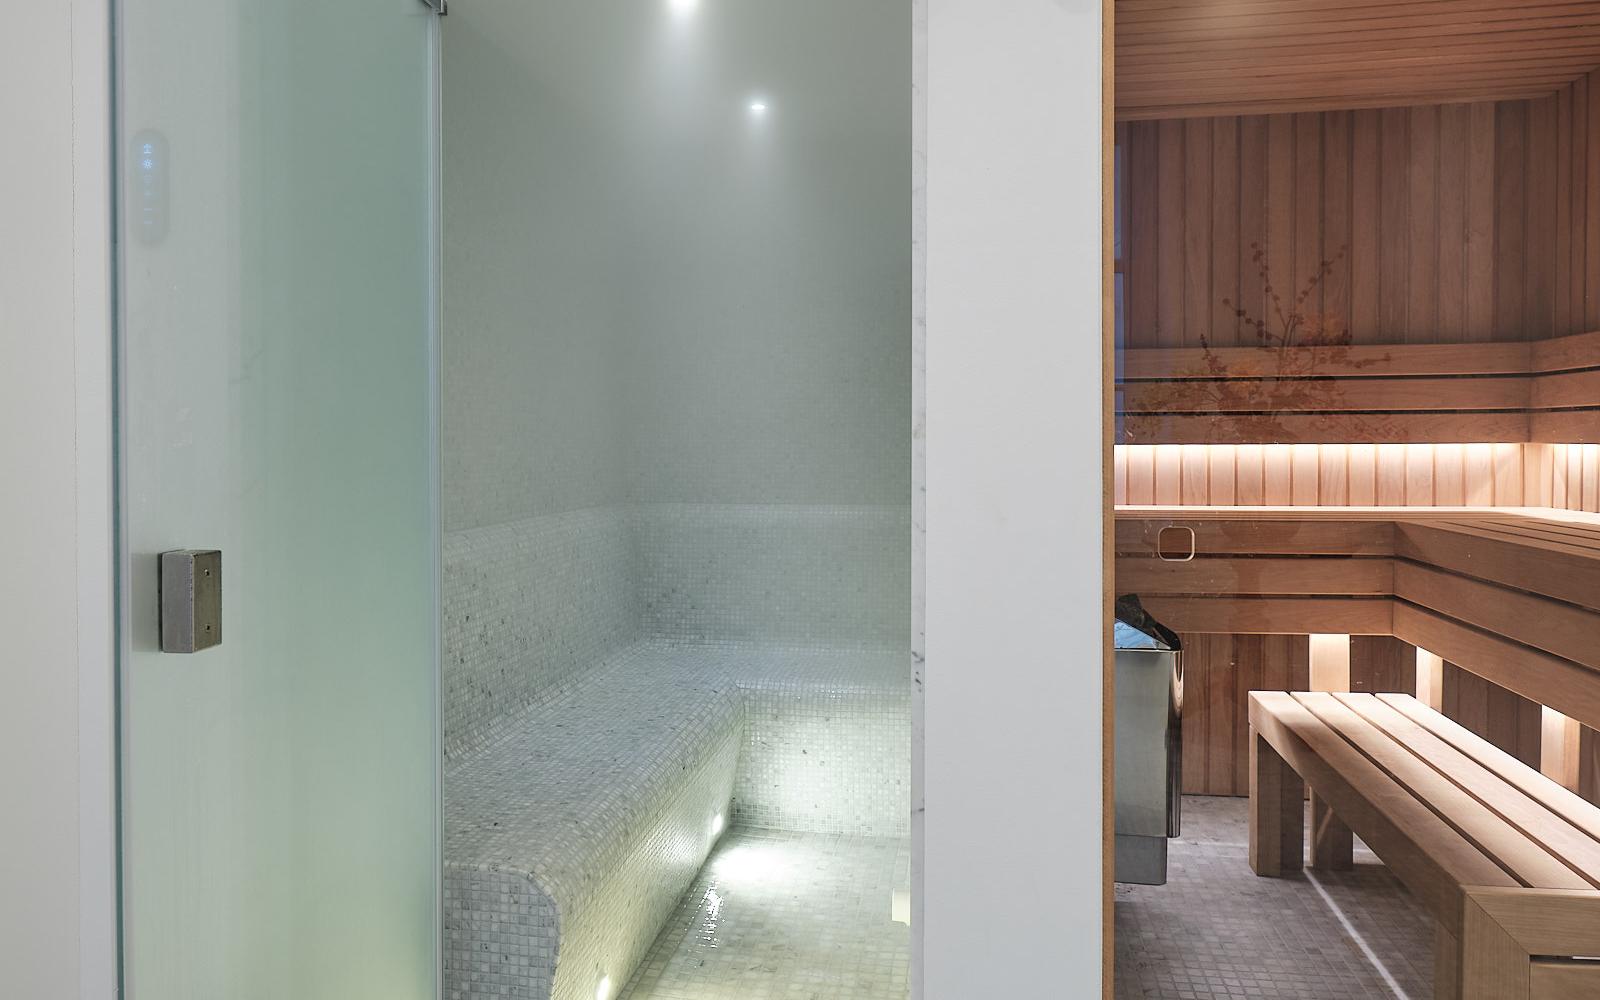 Wellness met lichte mozaïek, Cleopatra B.V., home wellness, genieten, stoomcabine, sauna